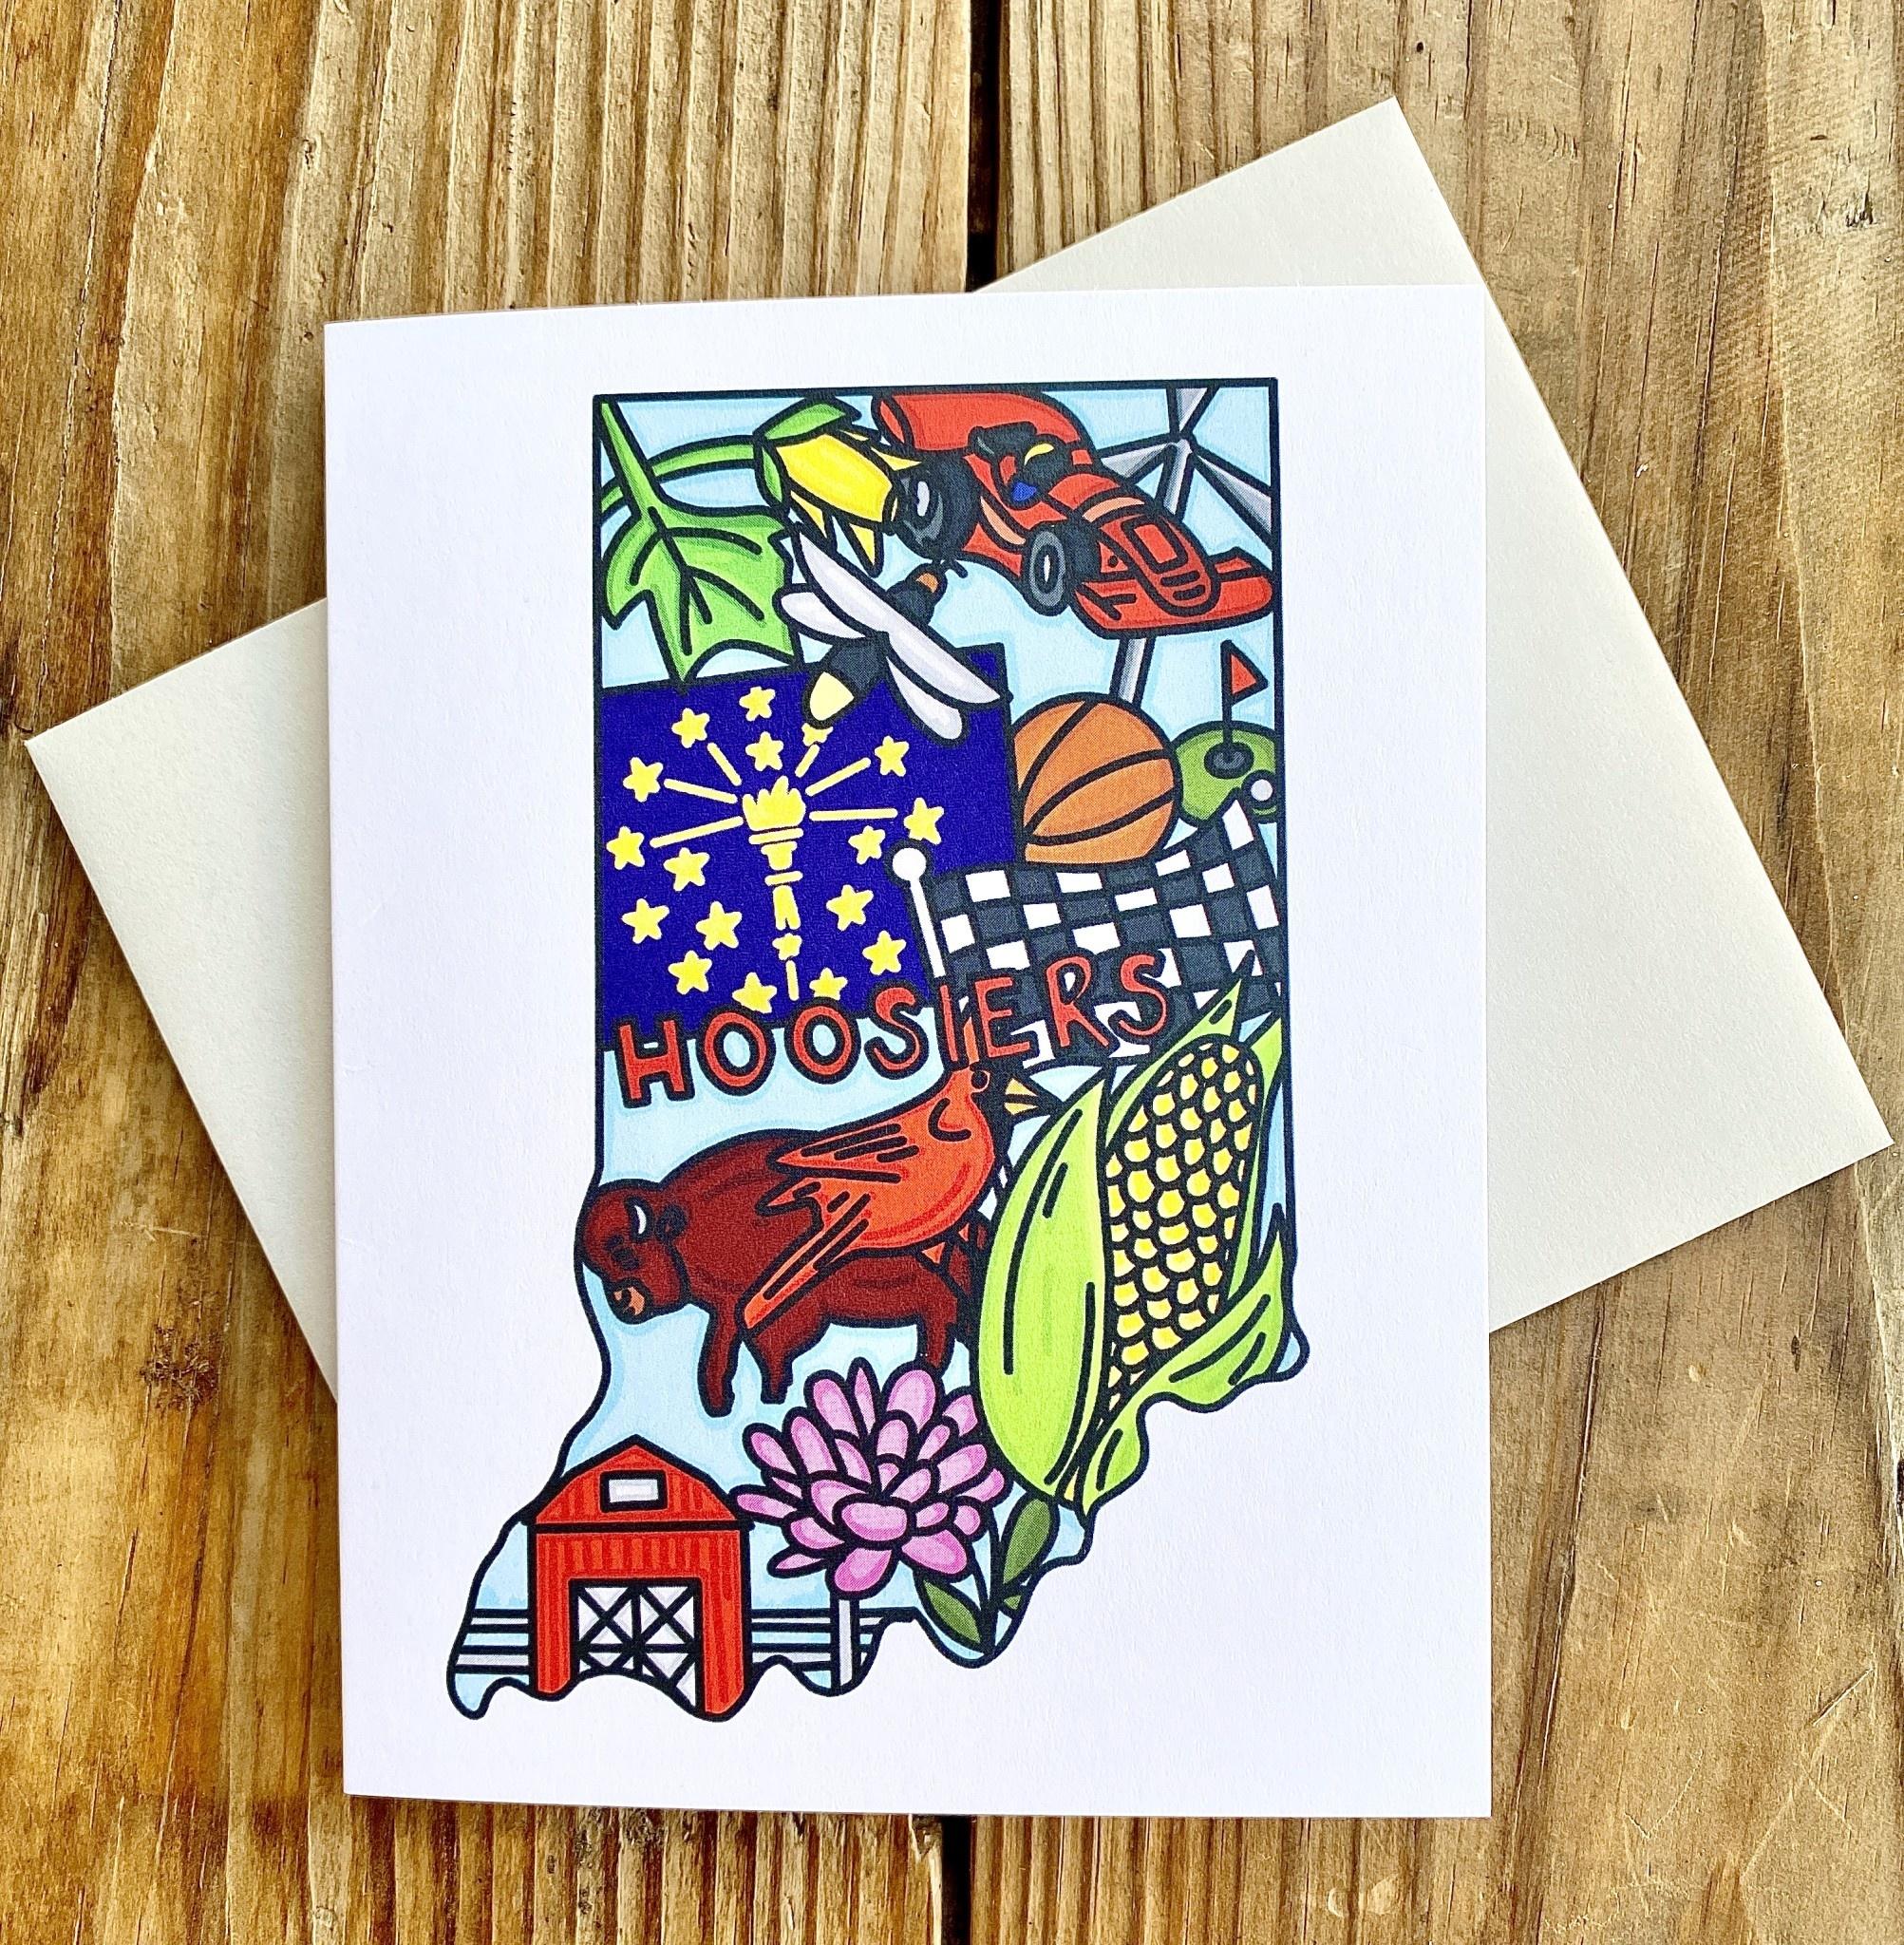 Fiber and Gloss Indiana Symbols Greeting Card